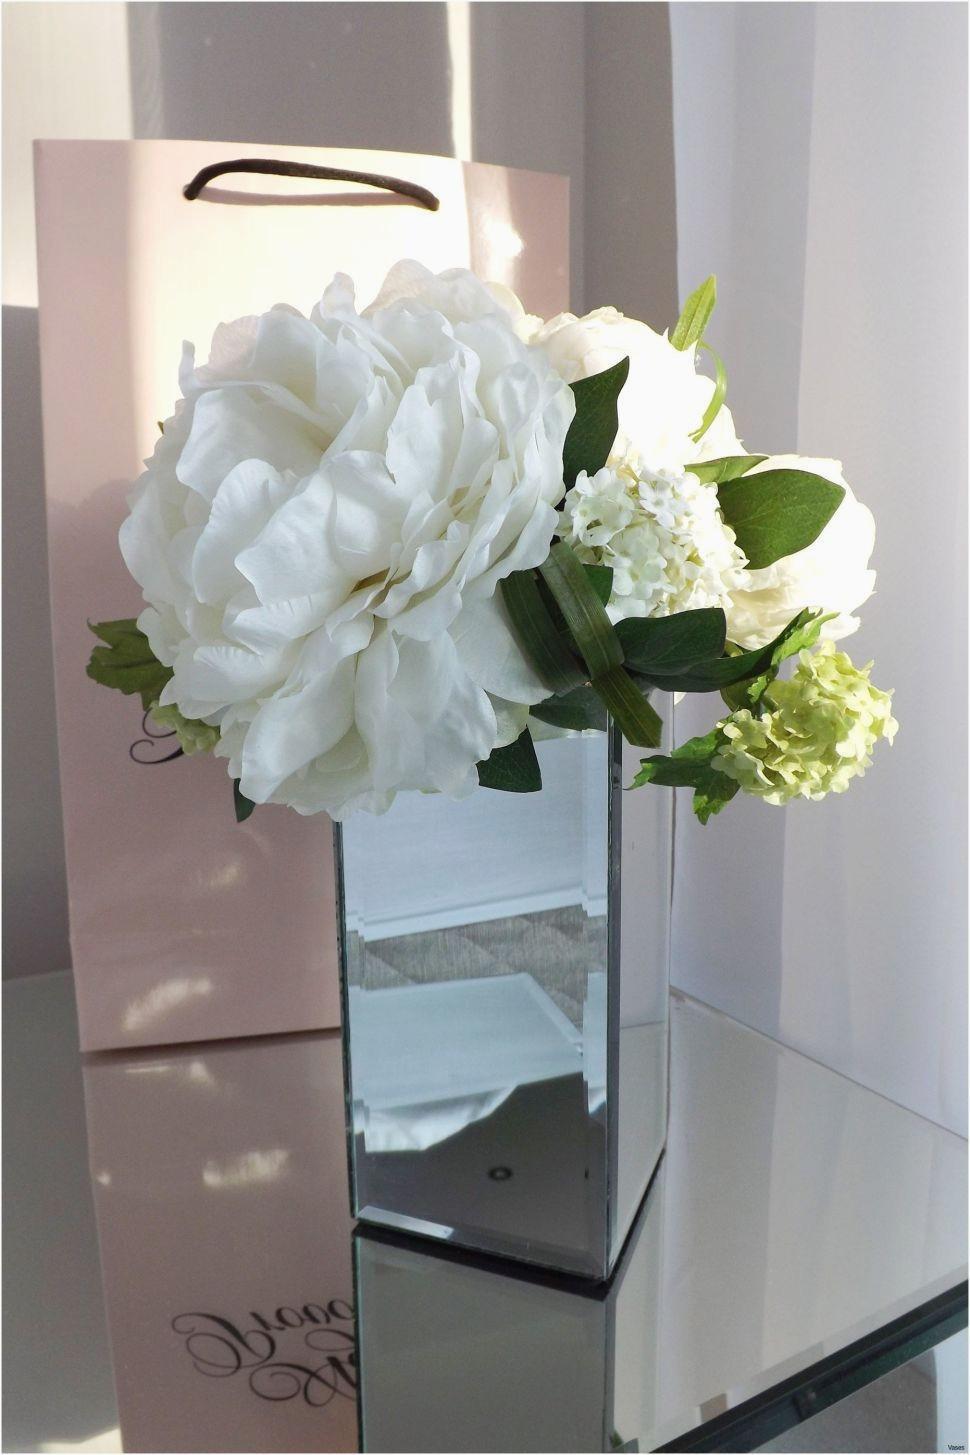 flower vase and stand of 17 elegant artificial flowers for dining table stampler regarding silk flowers metal vases 3h mirrored mosaic vase votivei 0d design design wedding silk flower